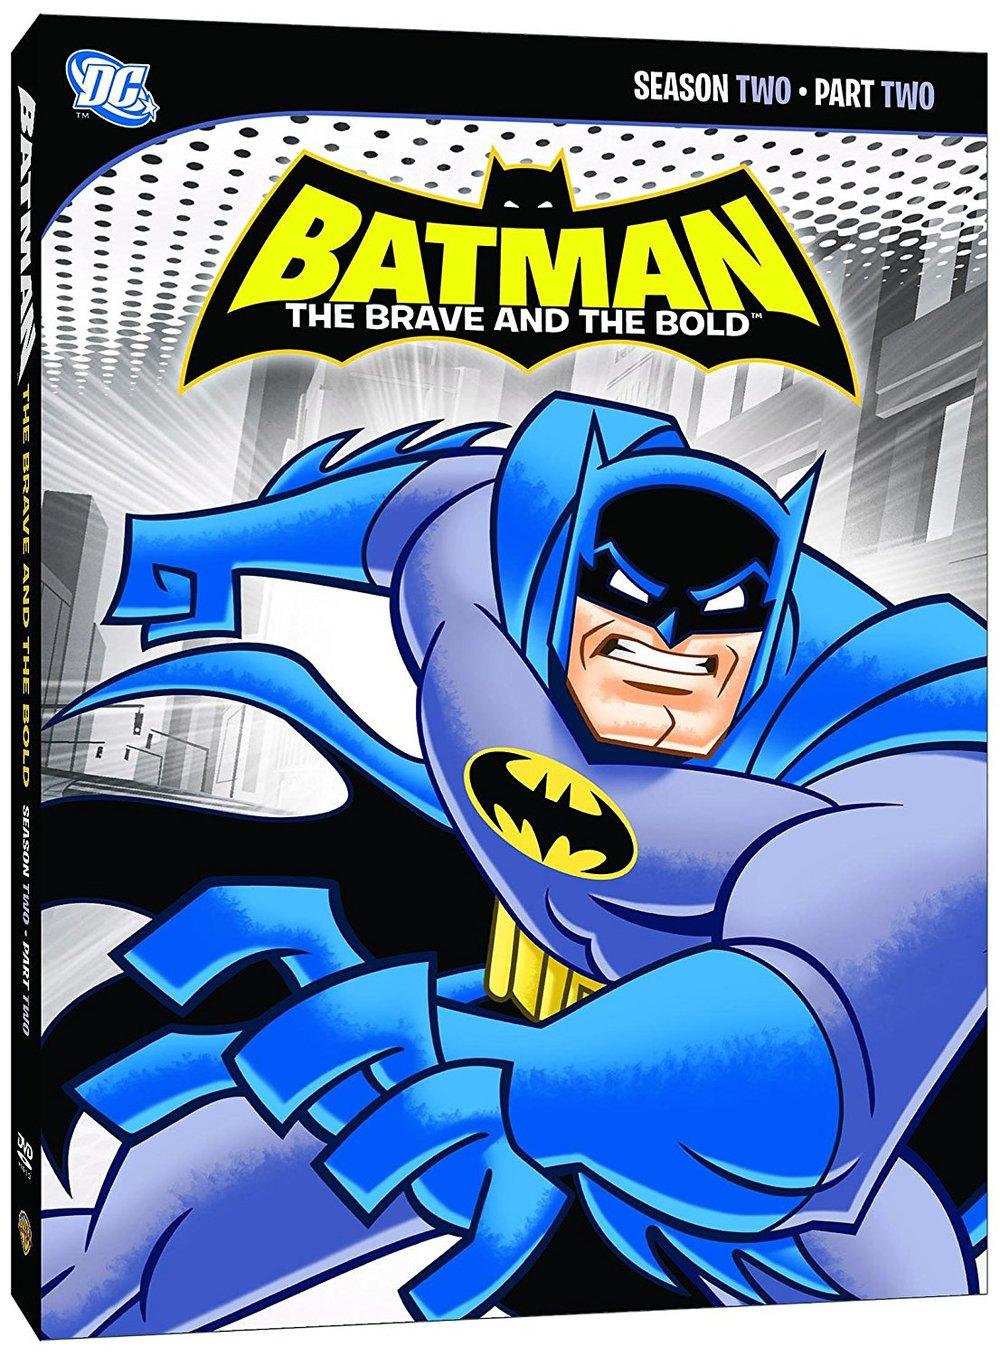 Batman Brave Bold S2 P2 KA.jpg